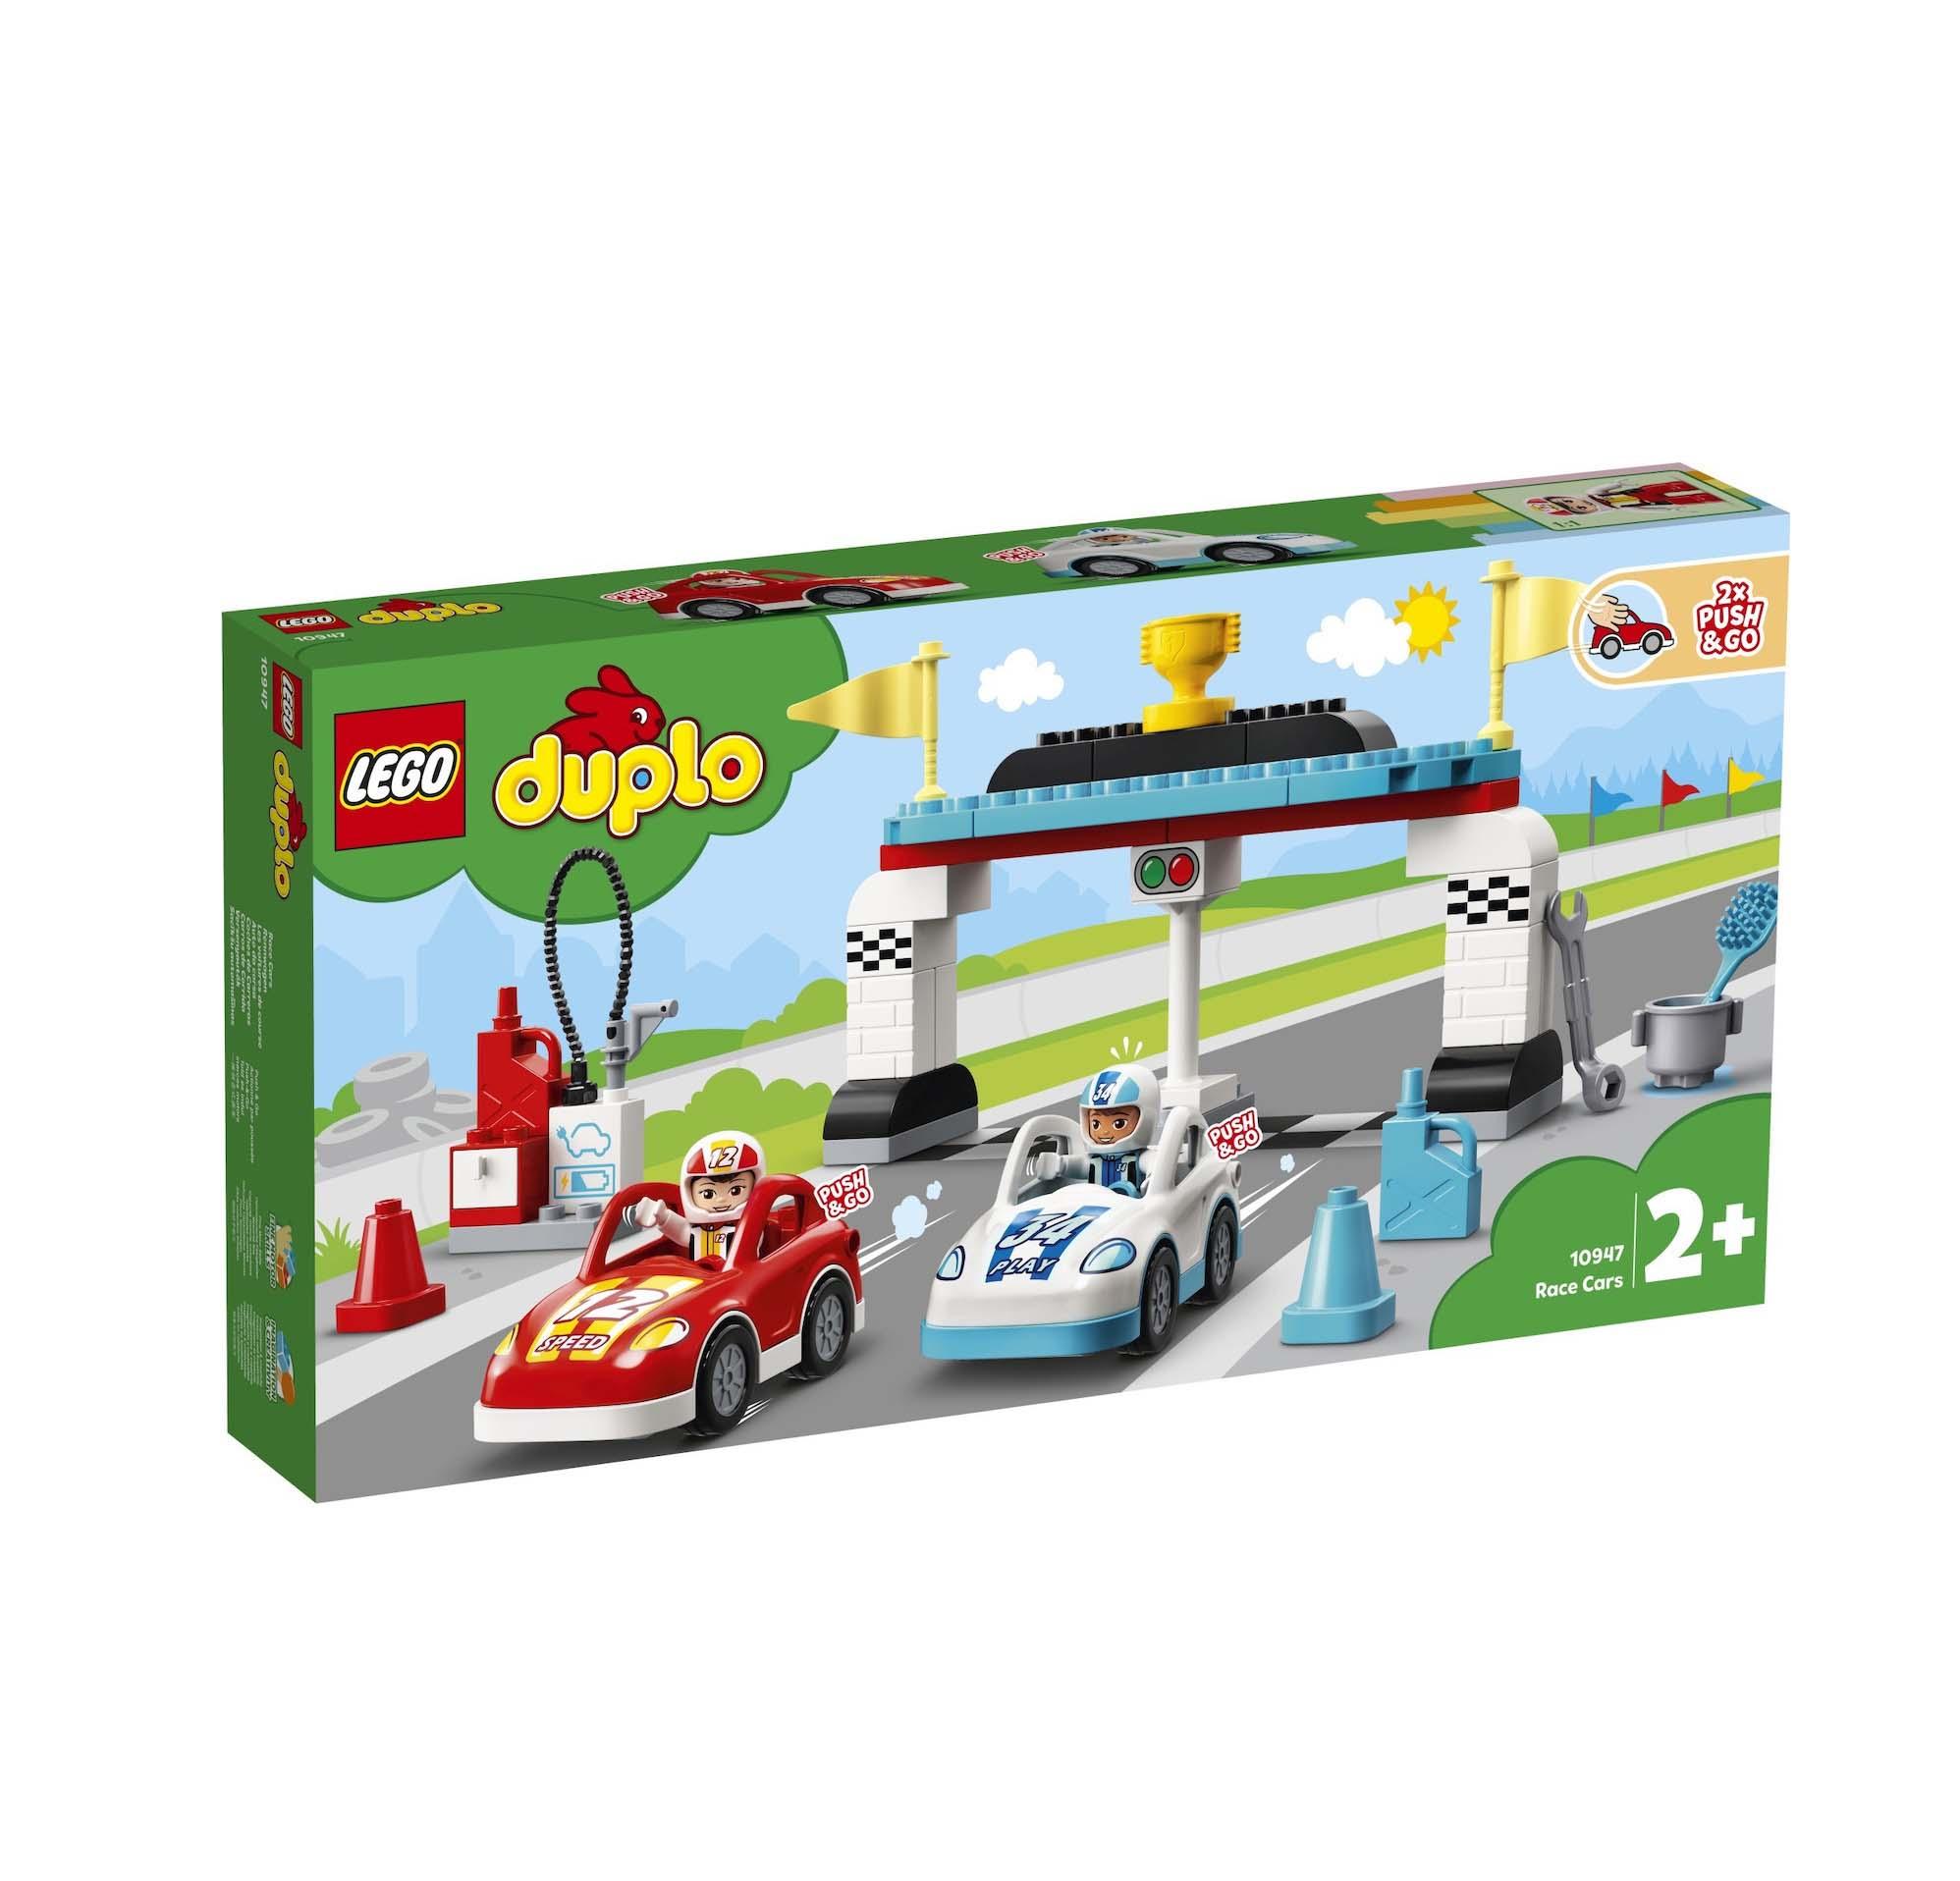 Lego Duplo: Race Cars 10947